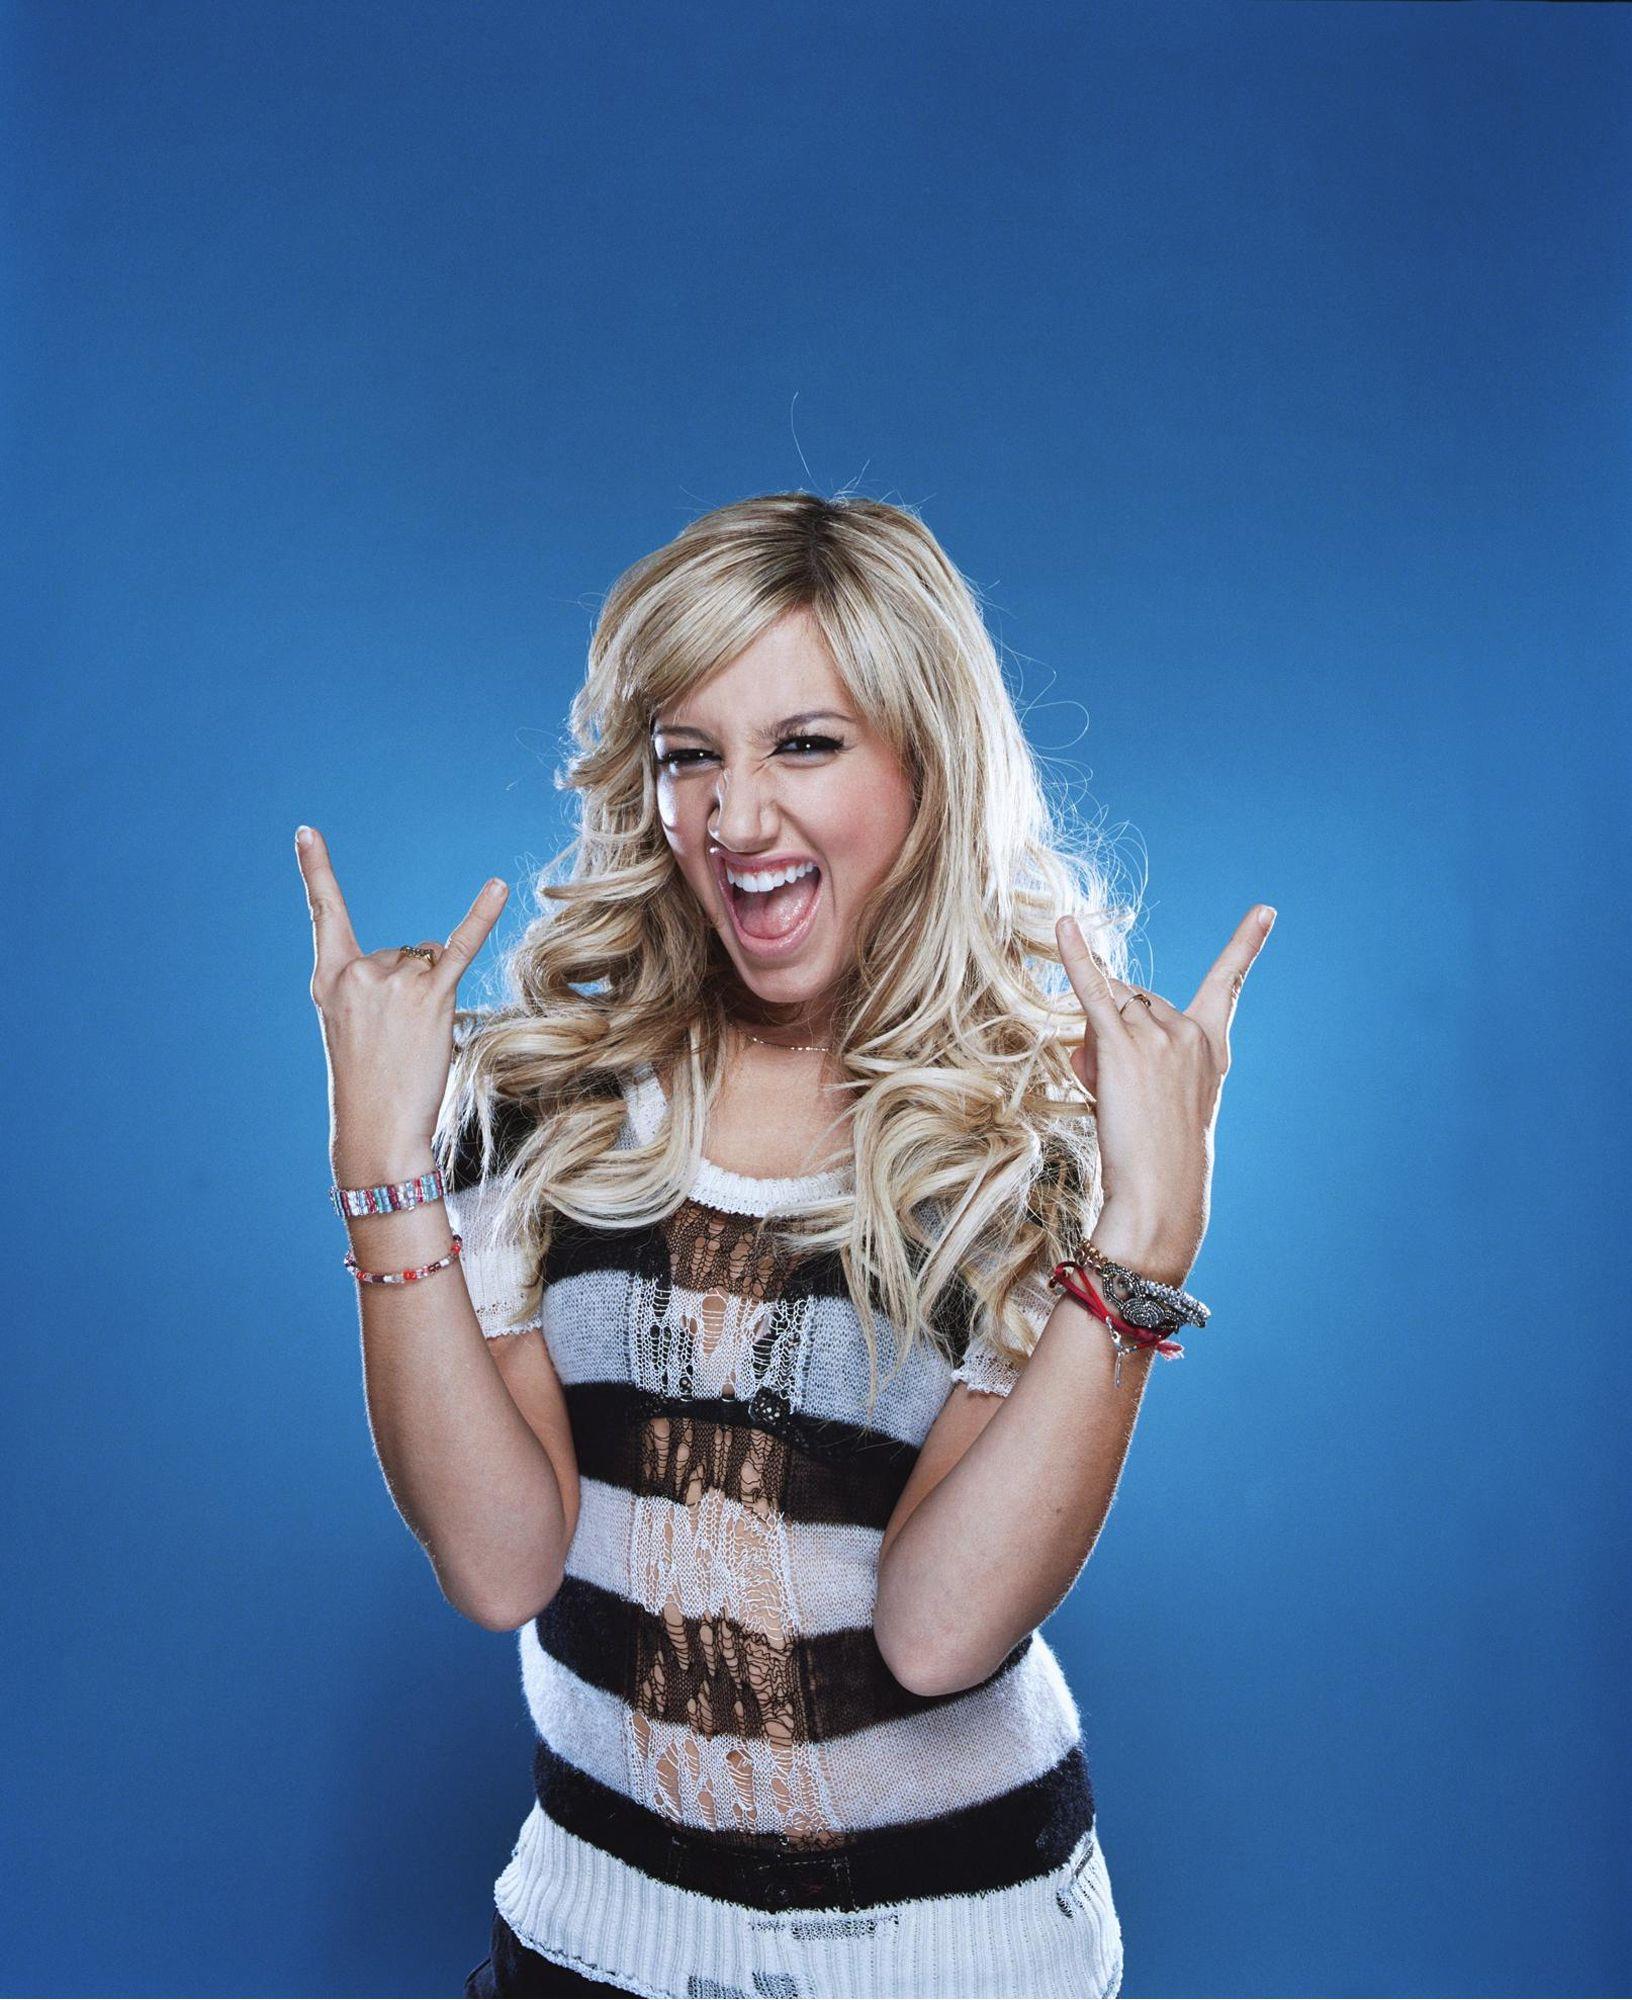 Ashley Tisdale - HQCelebrity.Org // HQ Celebrity Pictures